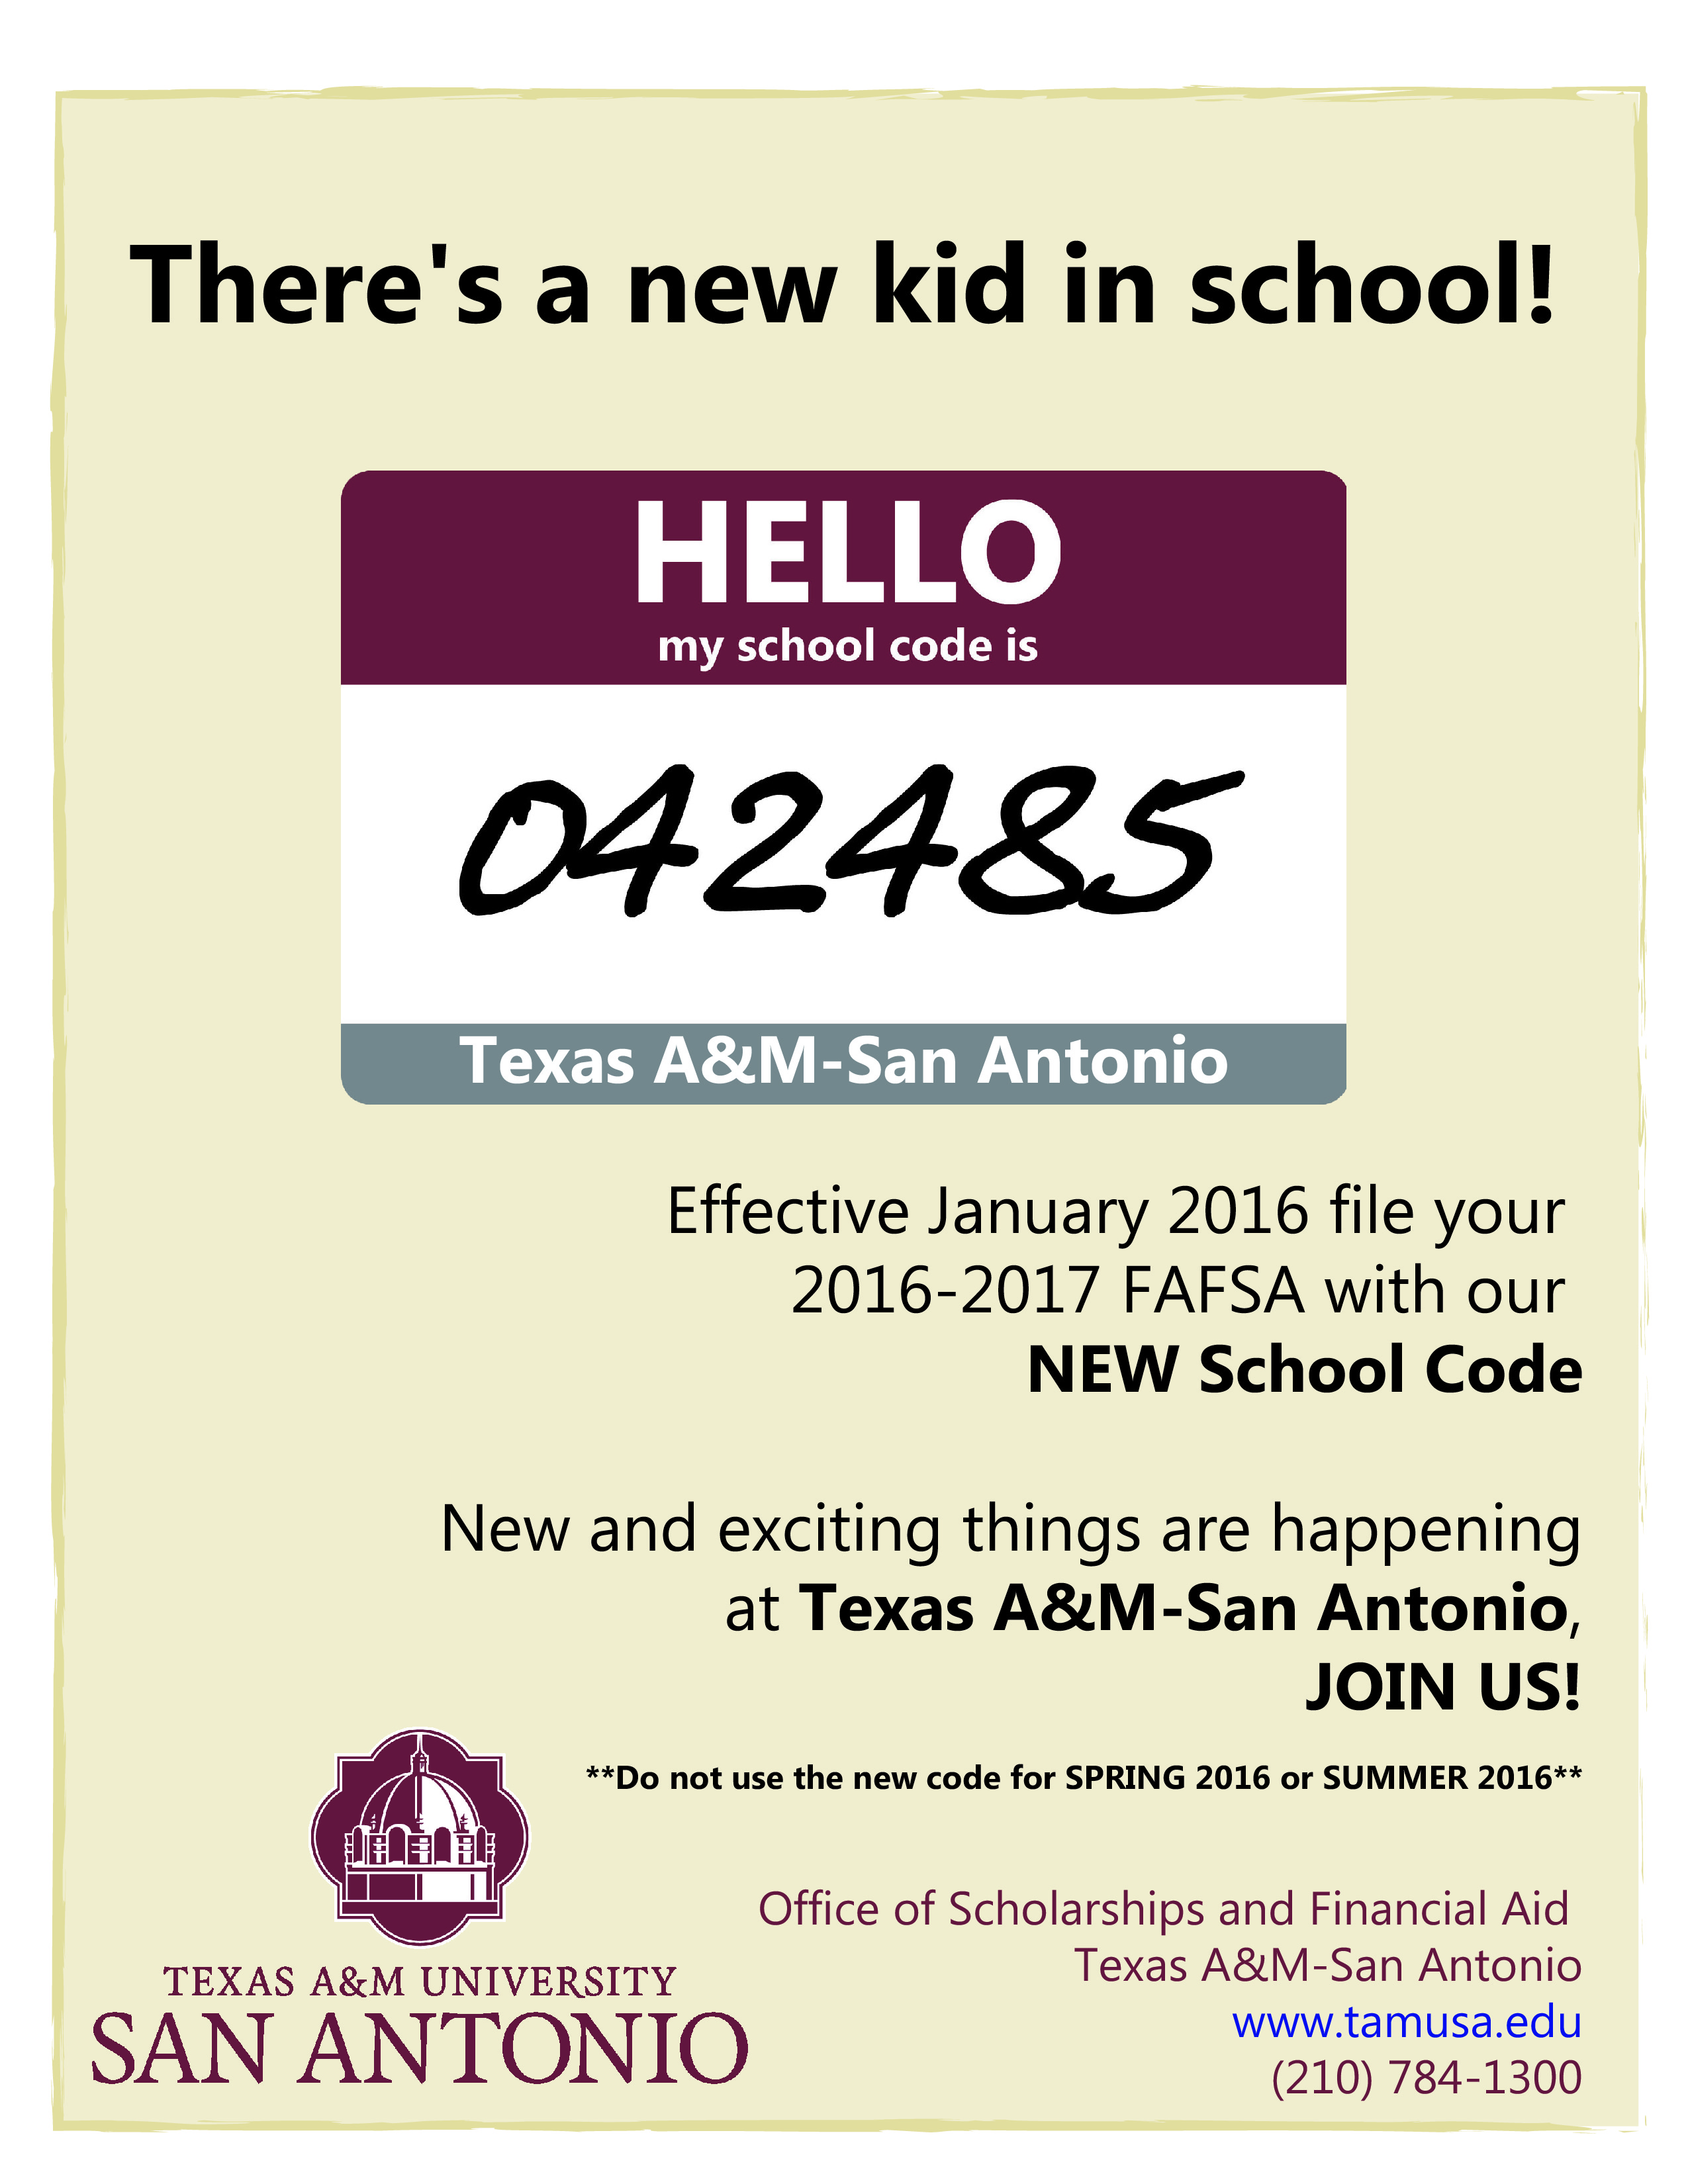 FAFSA School Code 042485